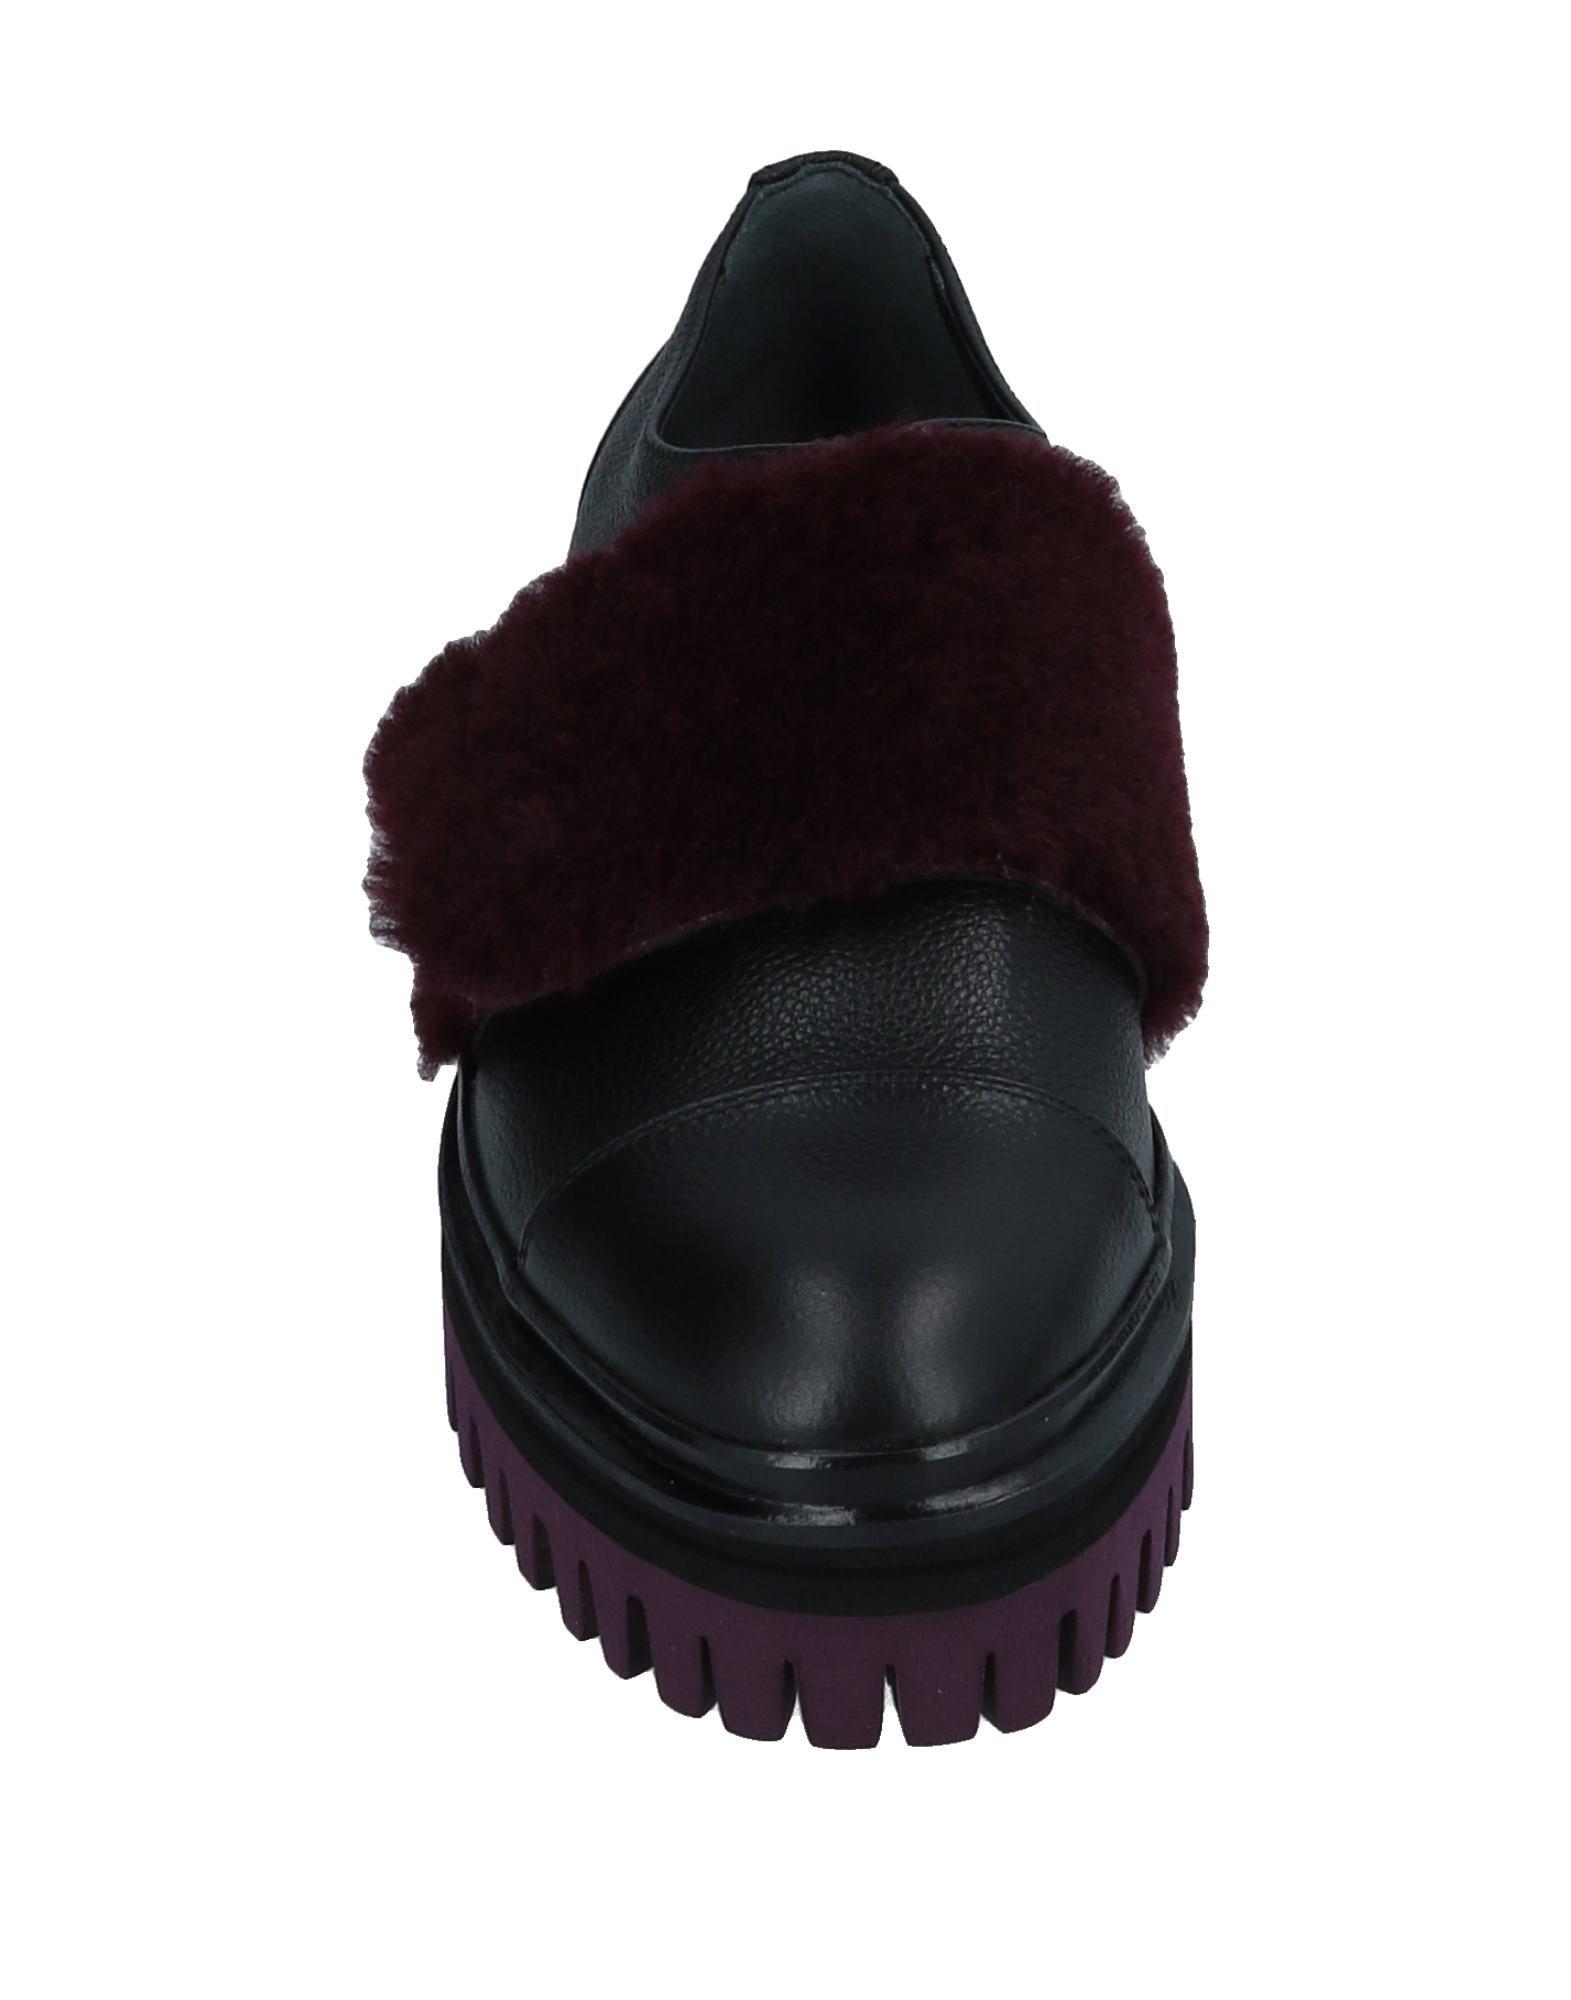 Alberto Guardiani Mokassins Damen strapazierfähige  11563800JUGut aussehende strapazierfähige Damen Schuhe 5fe8d5